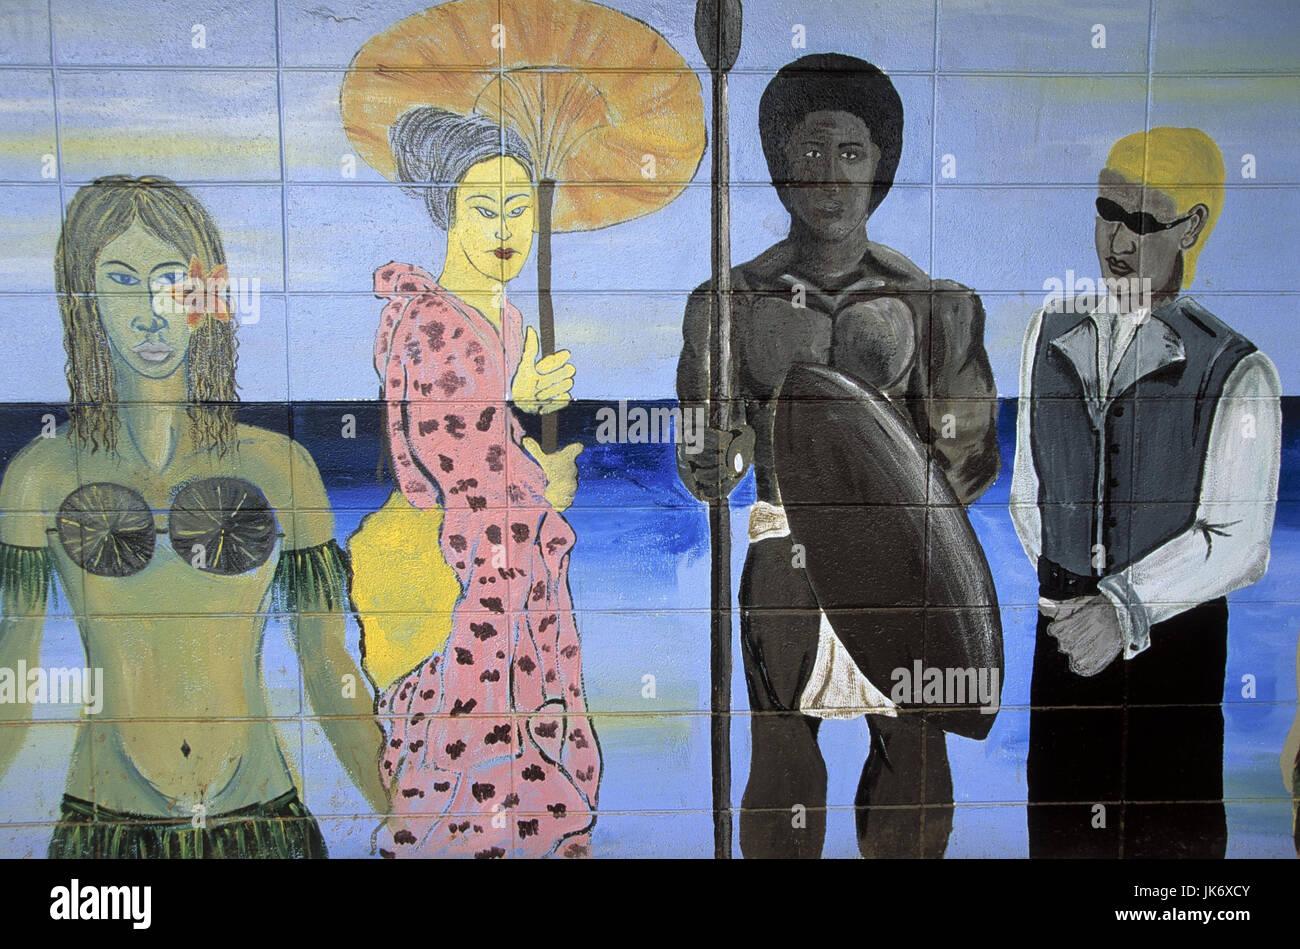 Fidschi Inseln, Viti Levu, Suva,  Mauer, bemalt, Personen,  Nationalitäten, verschieden Südsee, Insel, Wand, Malerei, Stock Photo